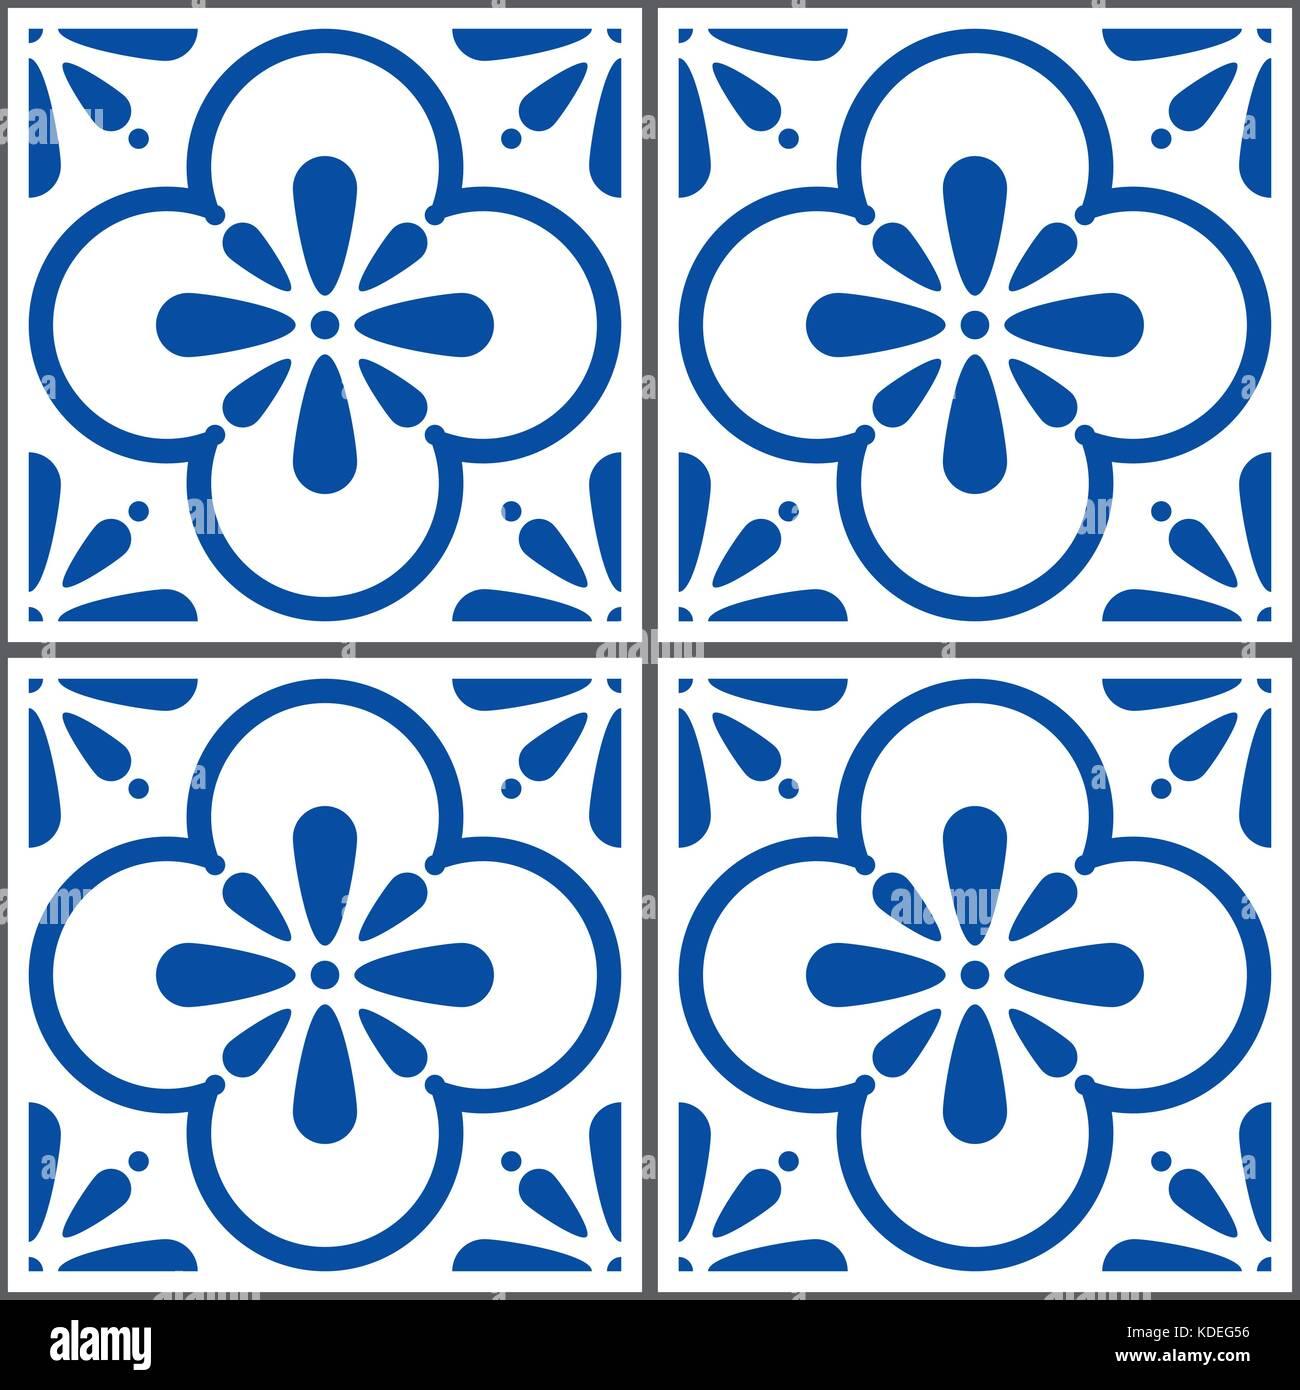 Azulejos vector tiles pattern, Portuguese seamless blue tiles design, Geometric ceramics - Stock Vector